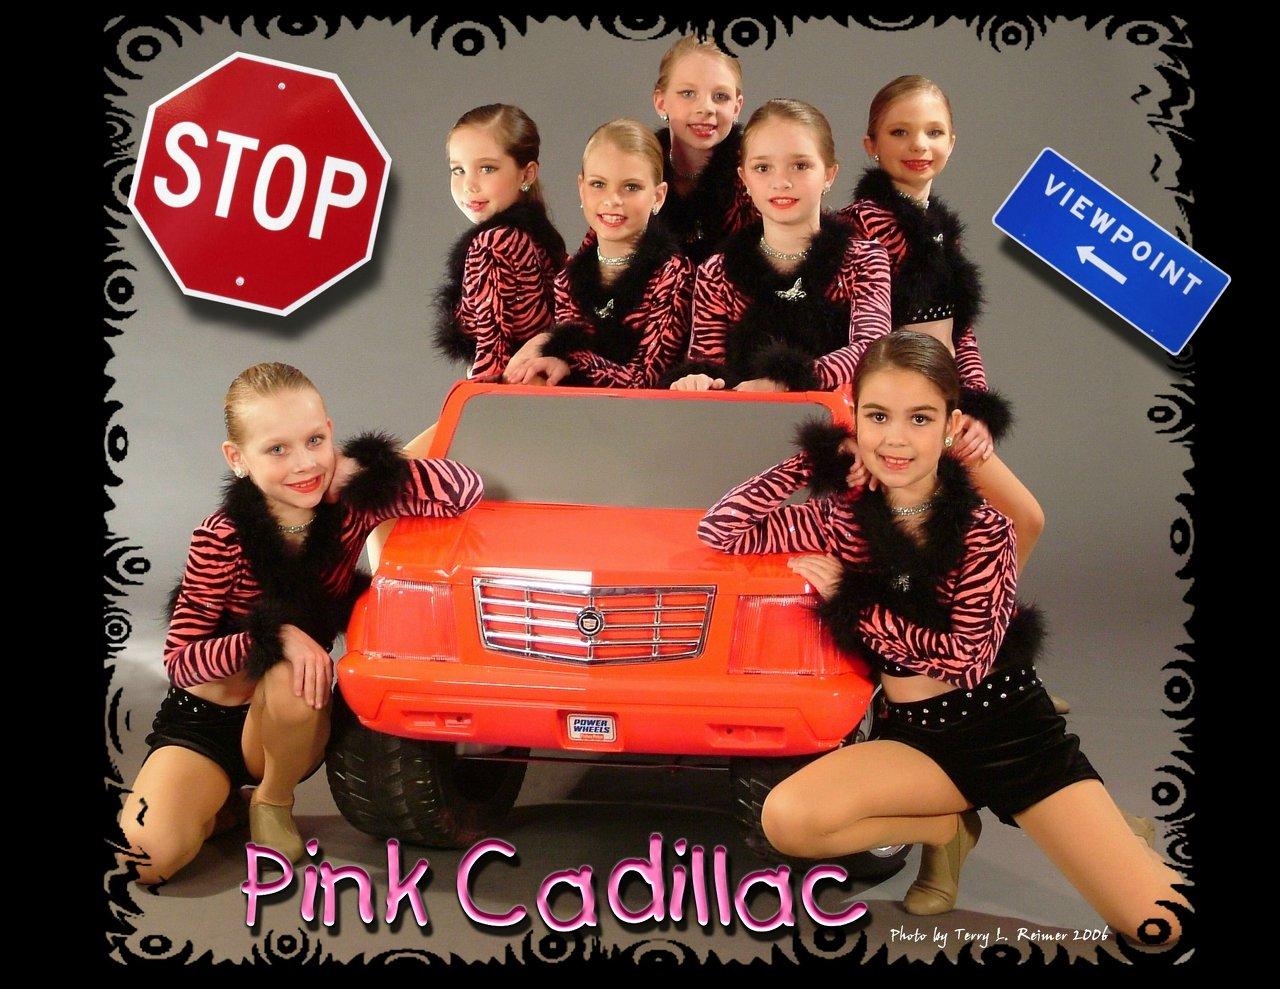 Pink Cadi-A.JPG